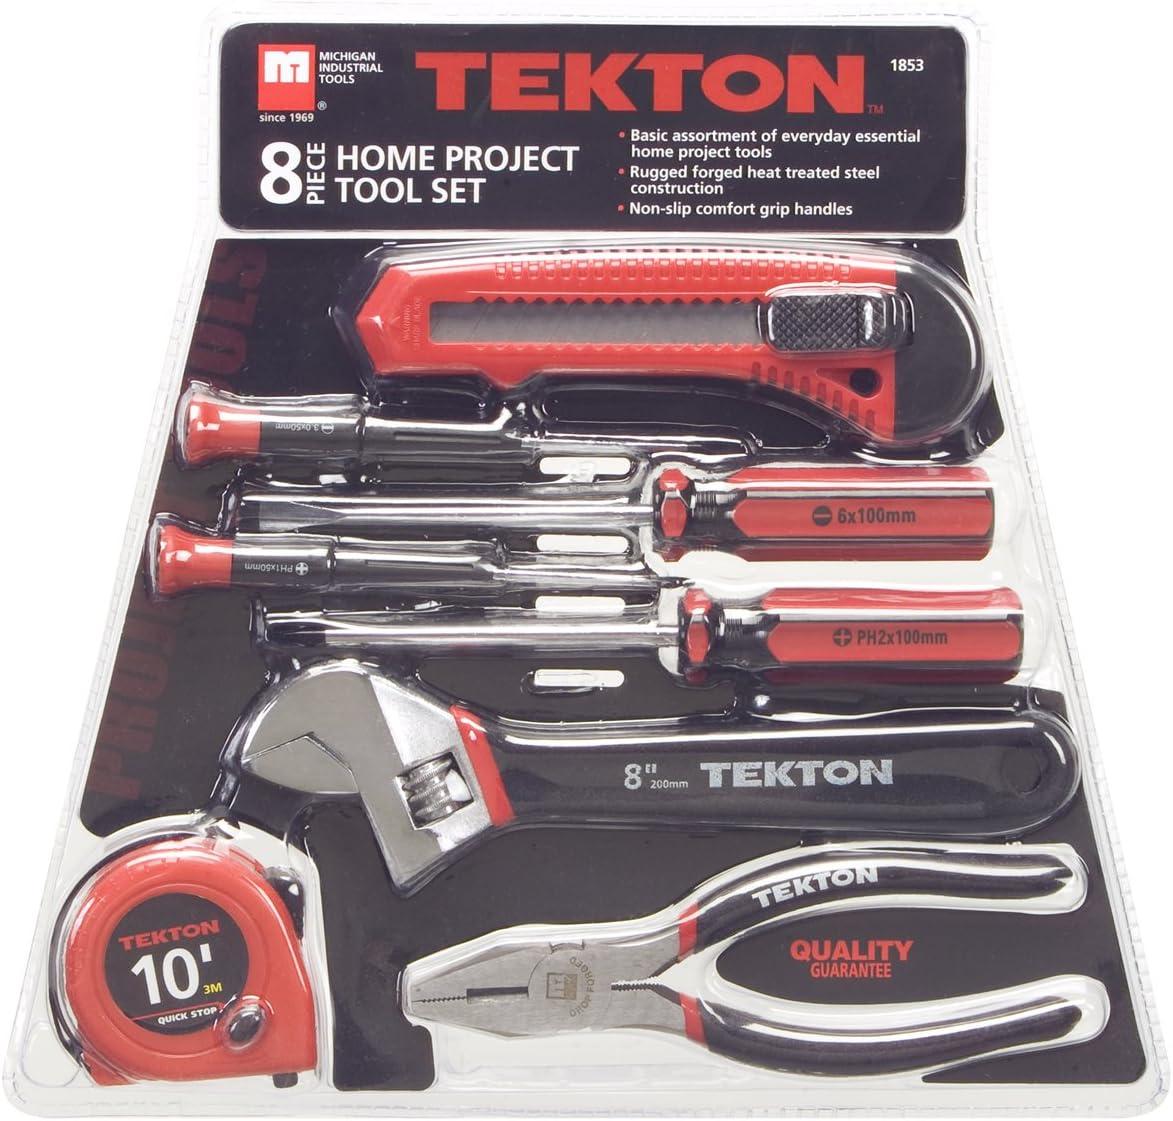 3-Piece TEKTON 1832 Home Project Tool Set